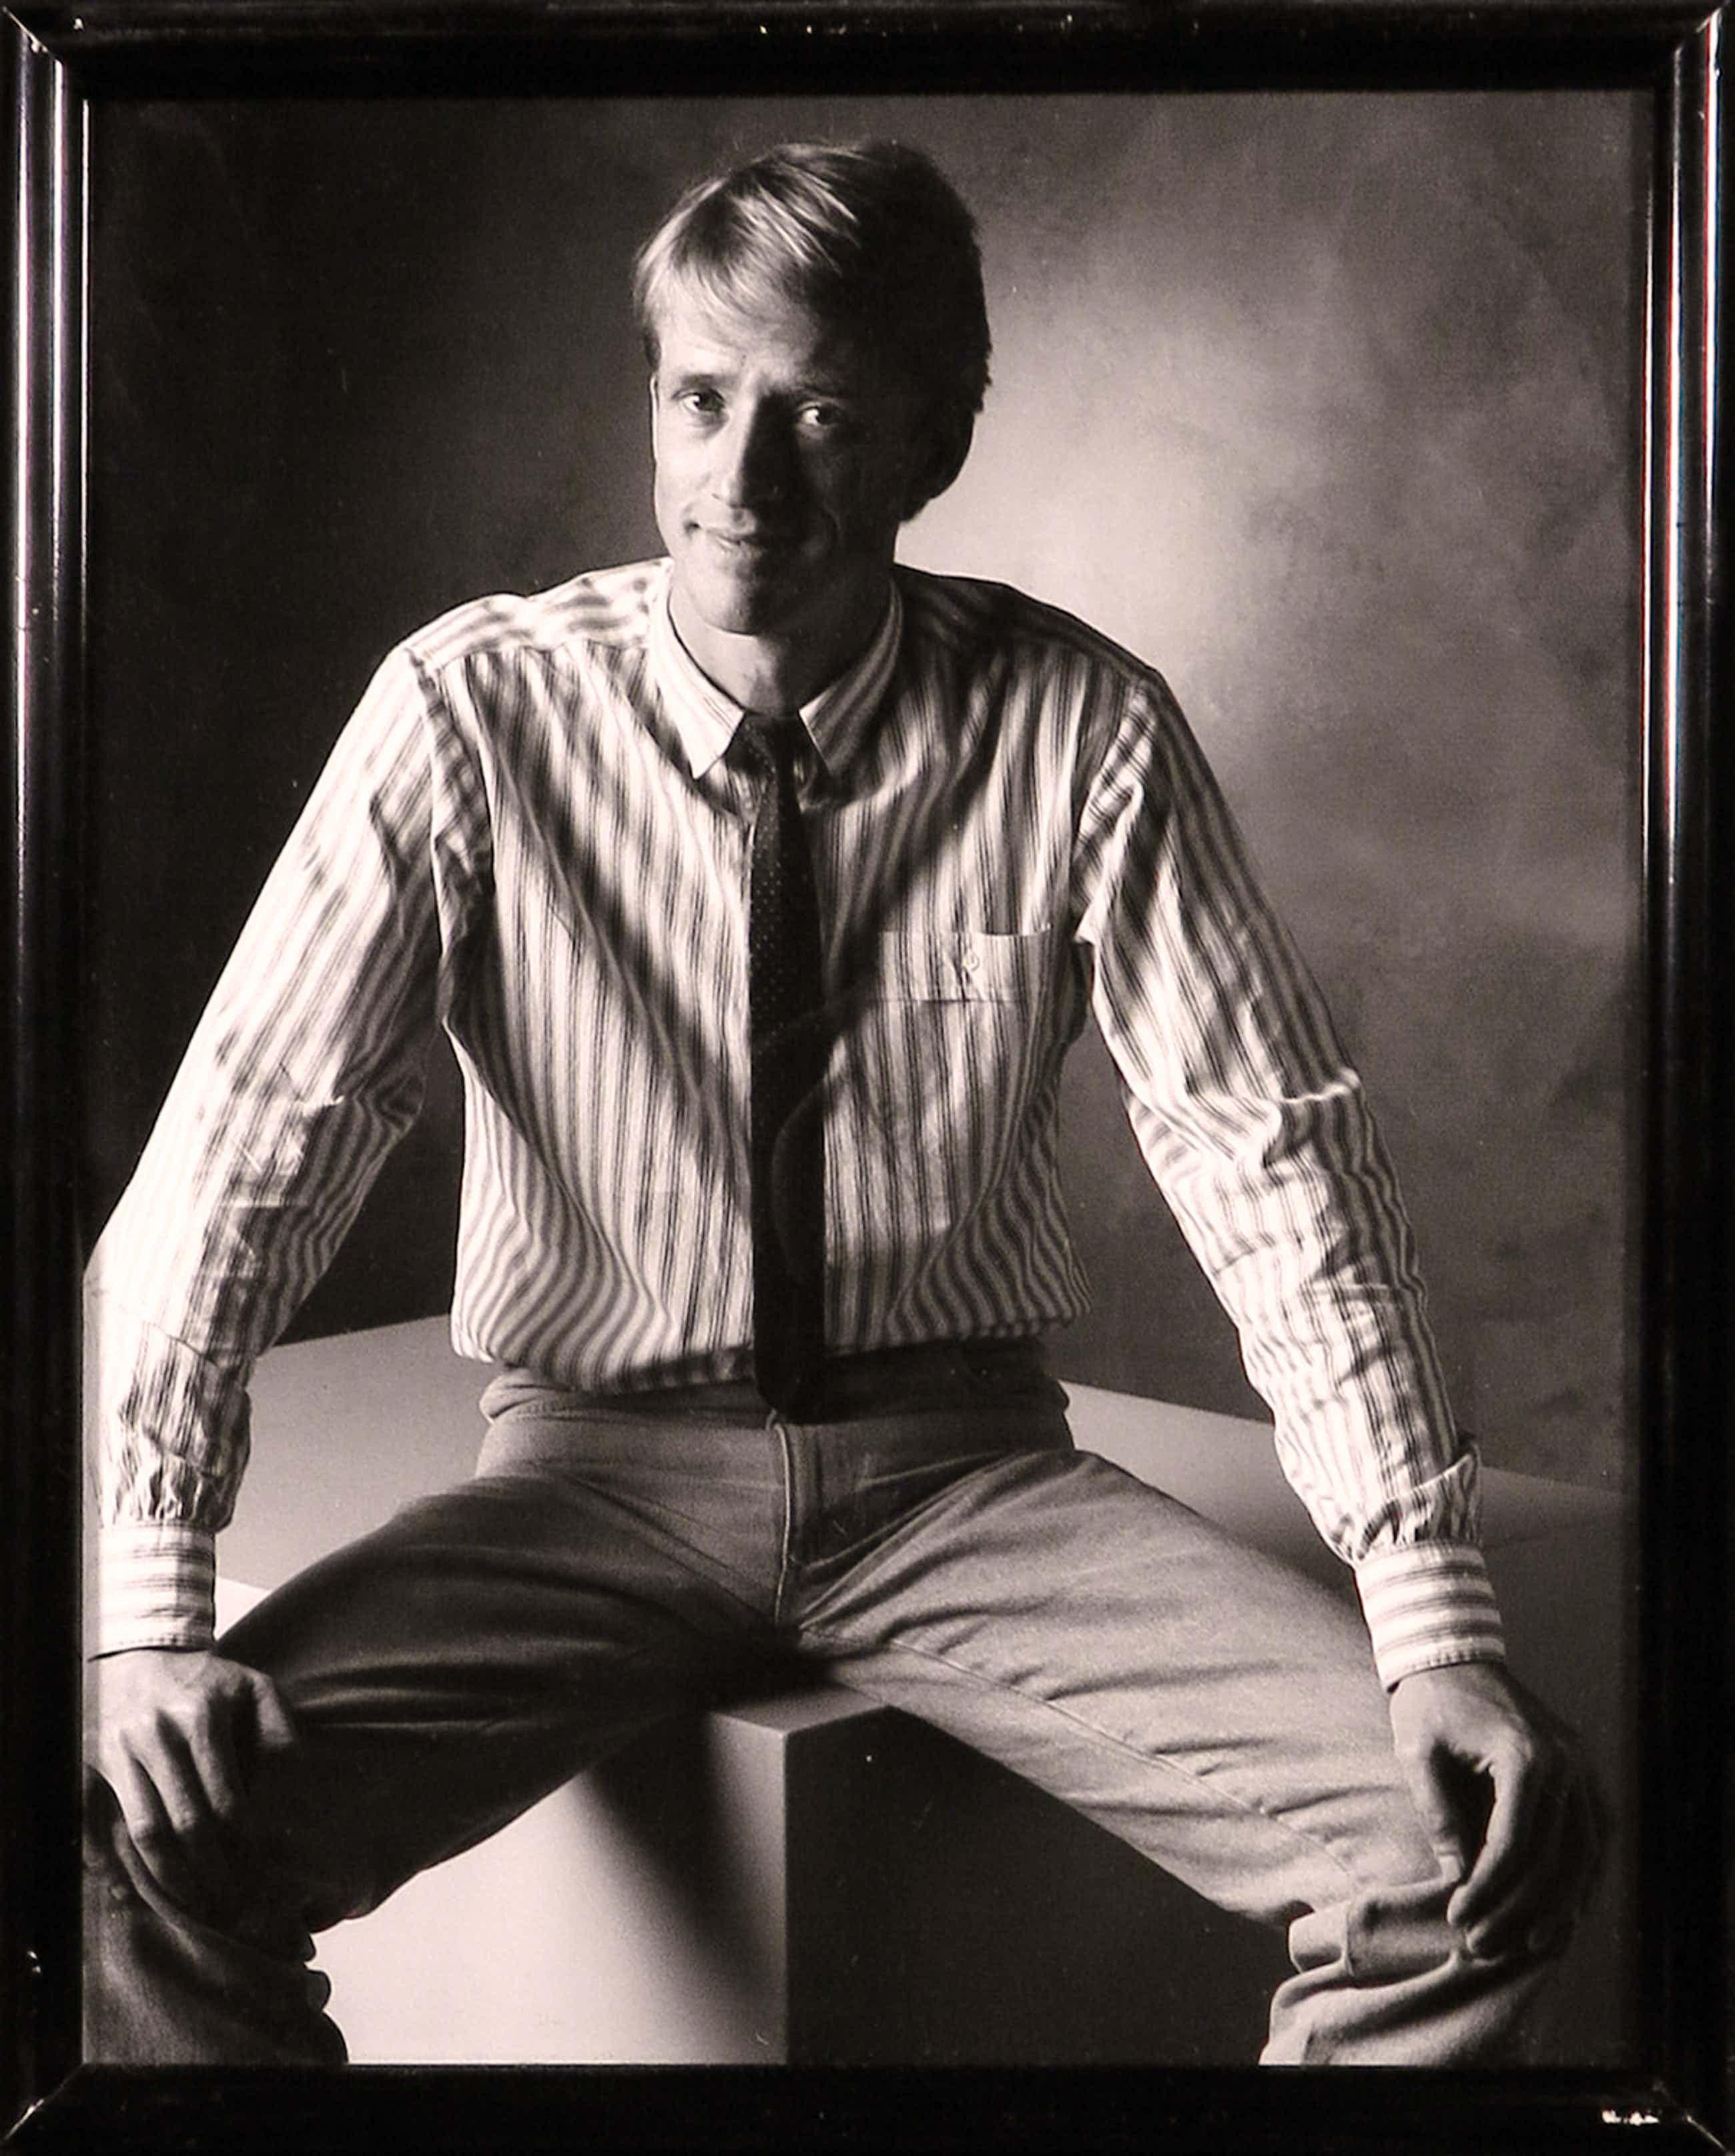 Paul Huf - Klassieke Foto, Jan Lenferink kopen? Bied vanaf 10!